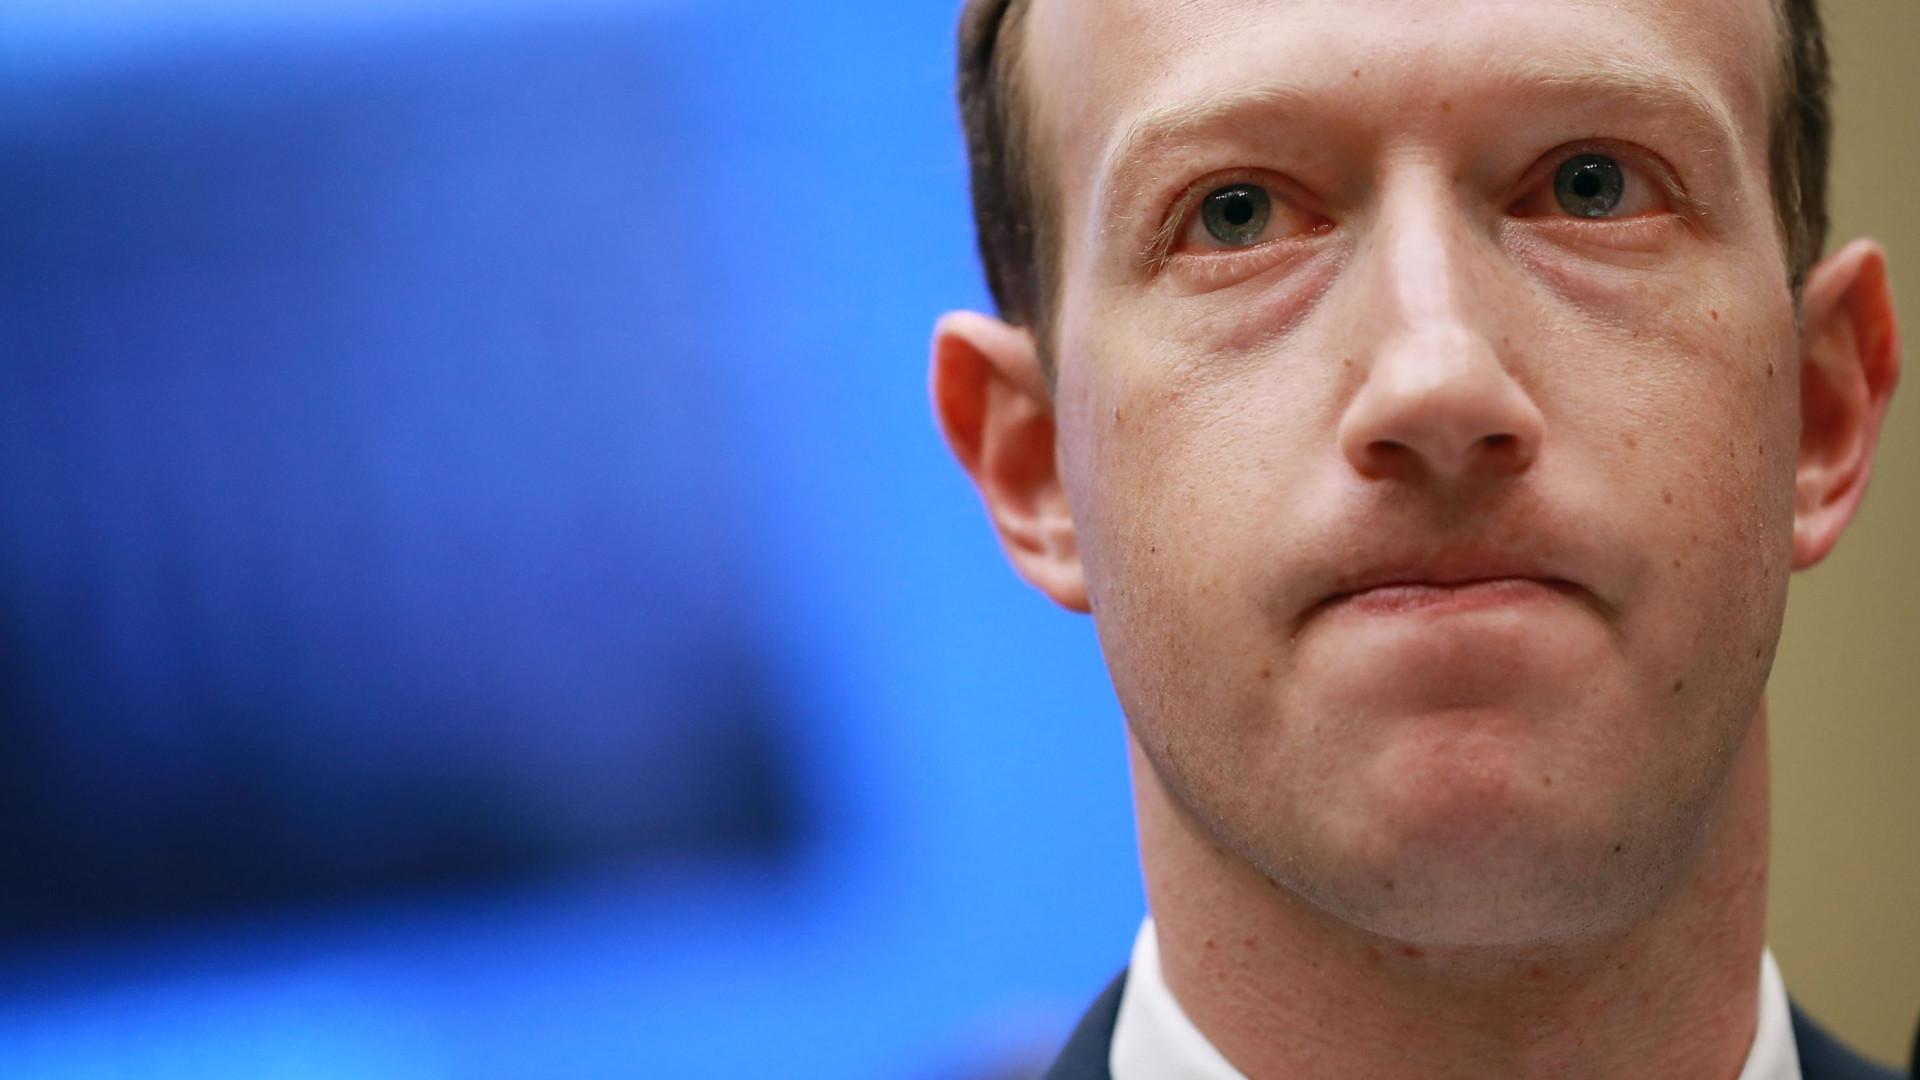 Tajani quer saber que medidas Zuckerberg vai tomar para defender cidadãos